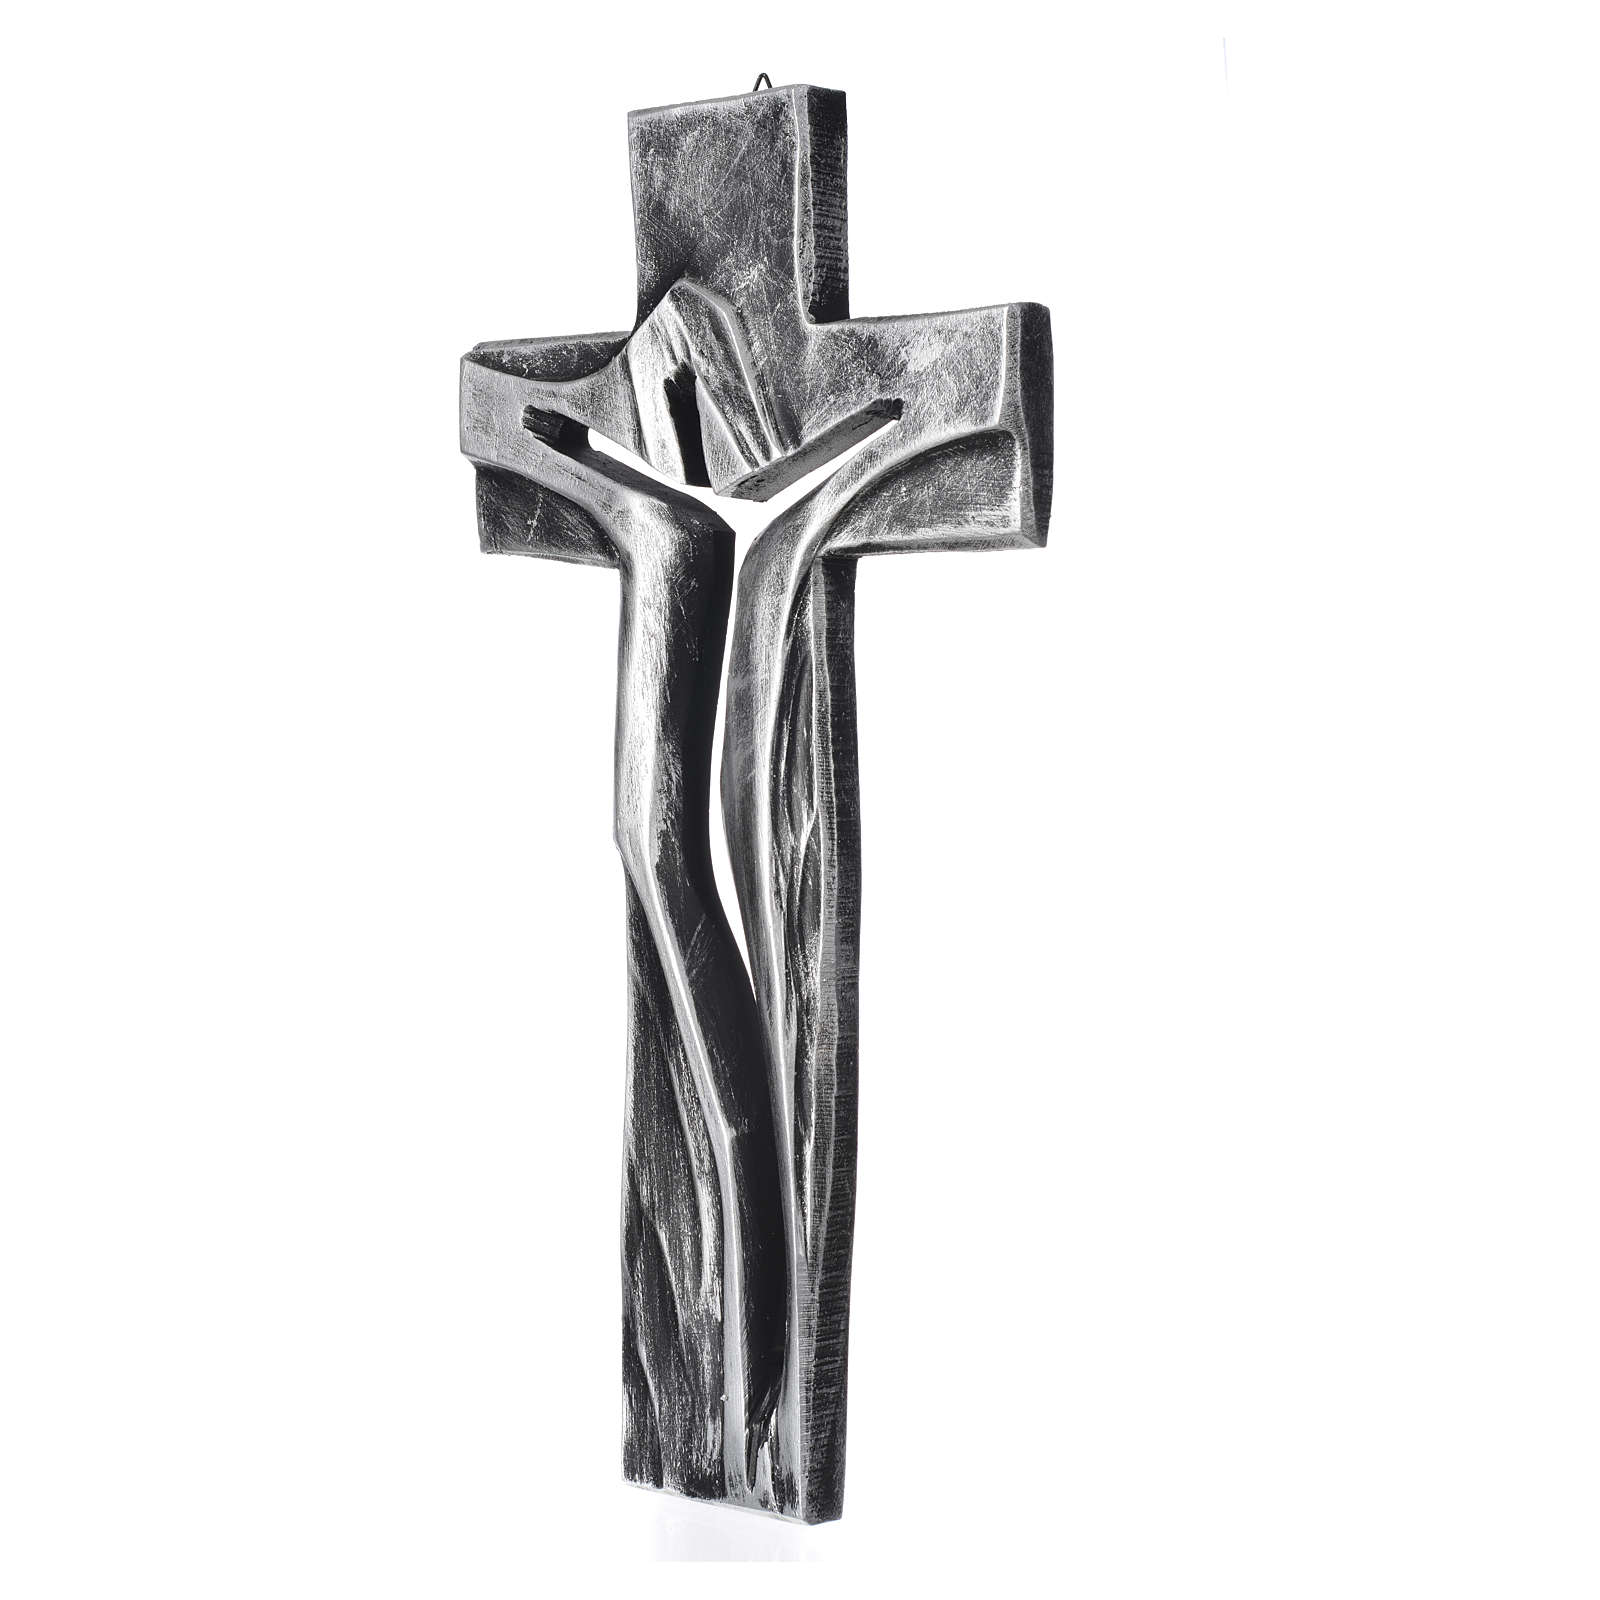 Crocifisso Medjugorje Cristo Risorto argentato resina 34x19 4